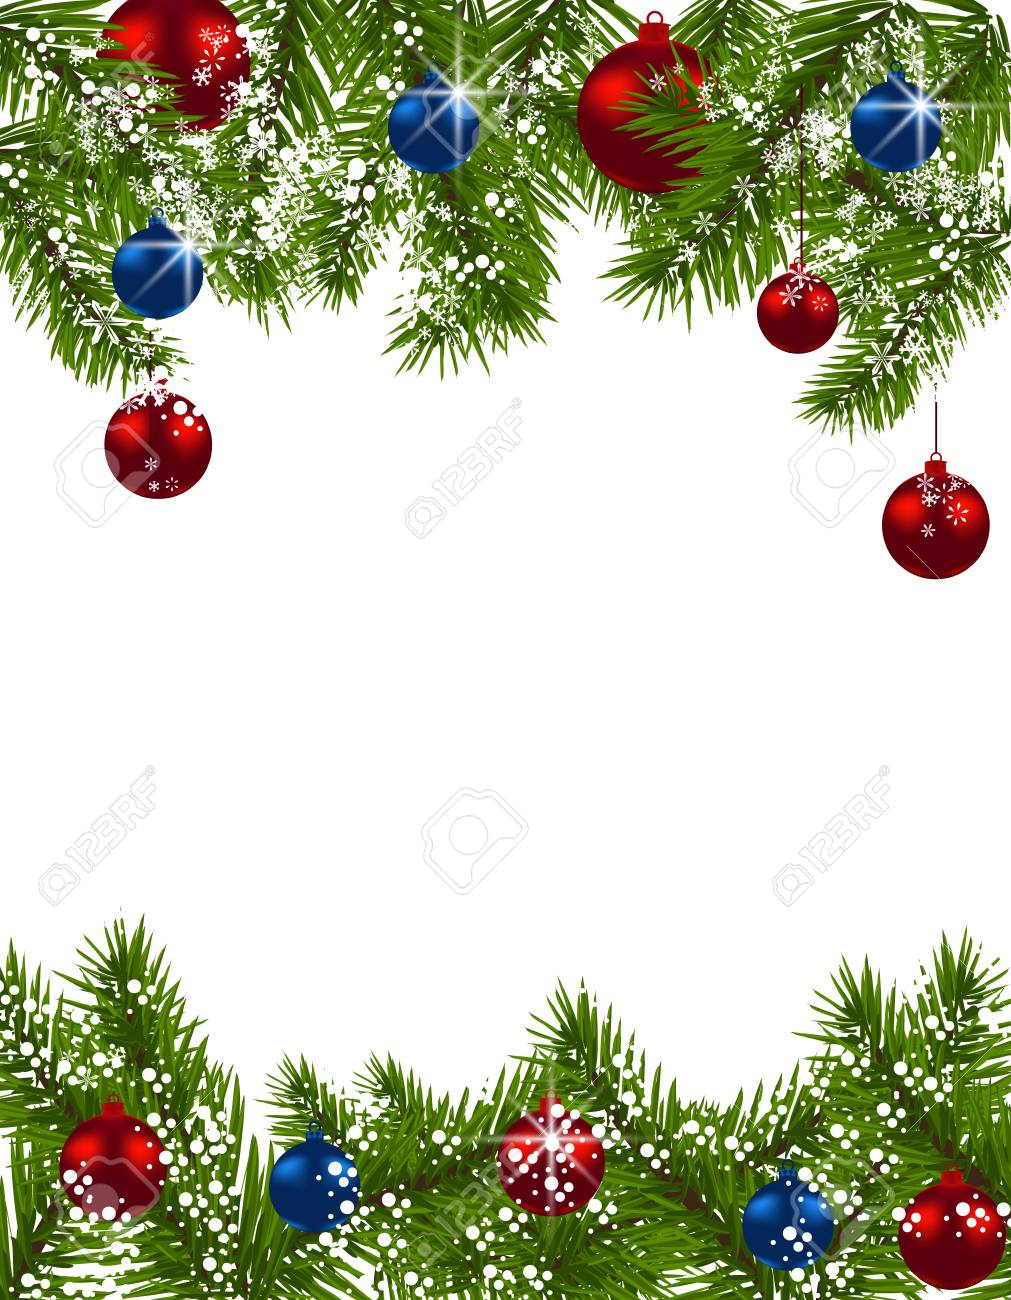 Cartes de Noël Boîte Vert Rouge Blanc 4 Designs 20 cartes Tesco de Noël